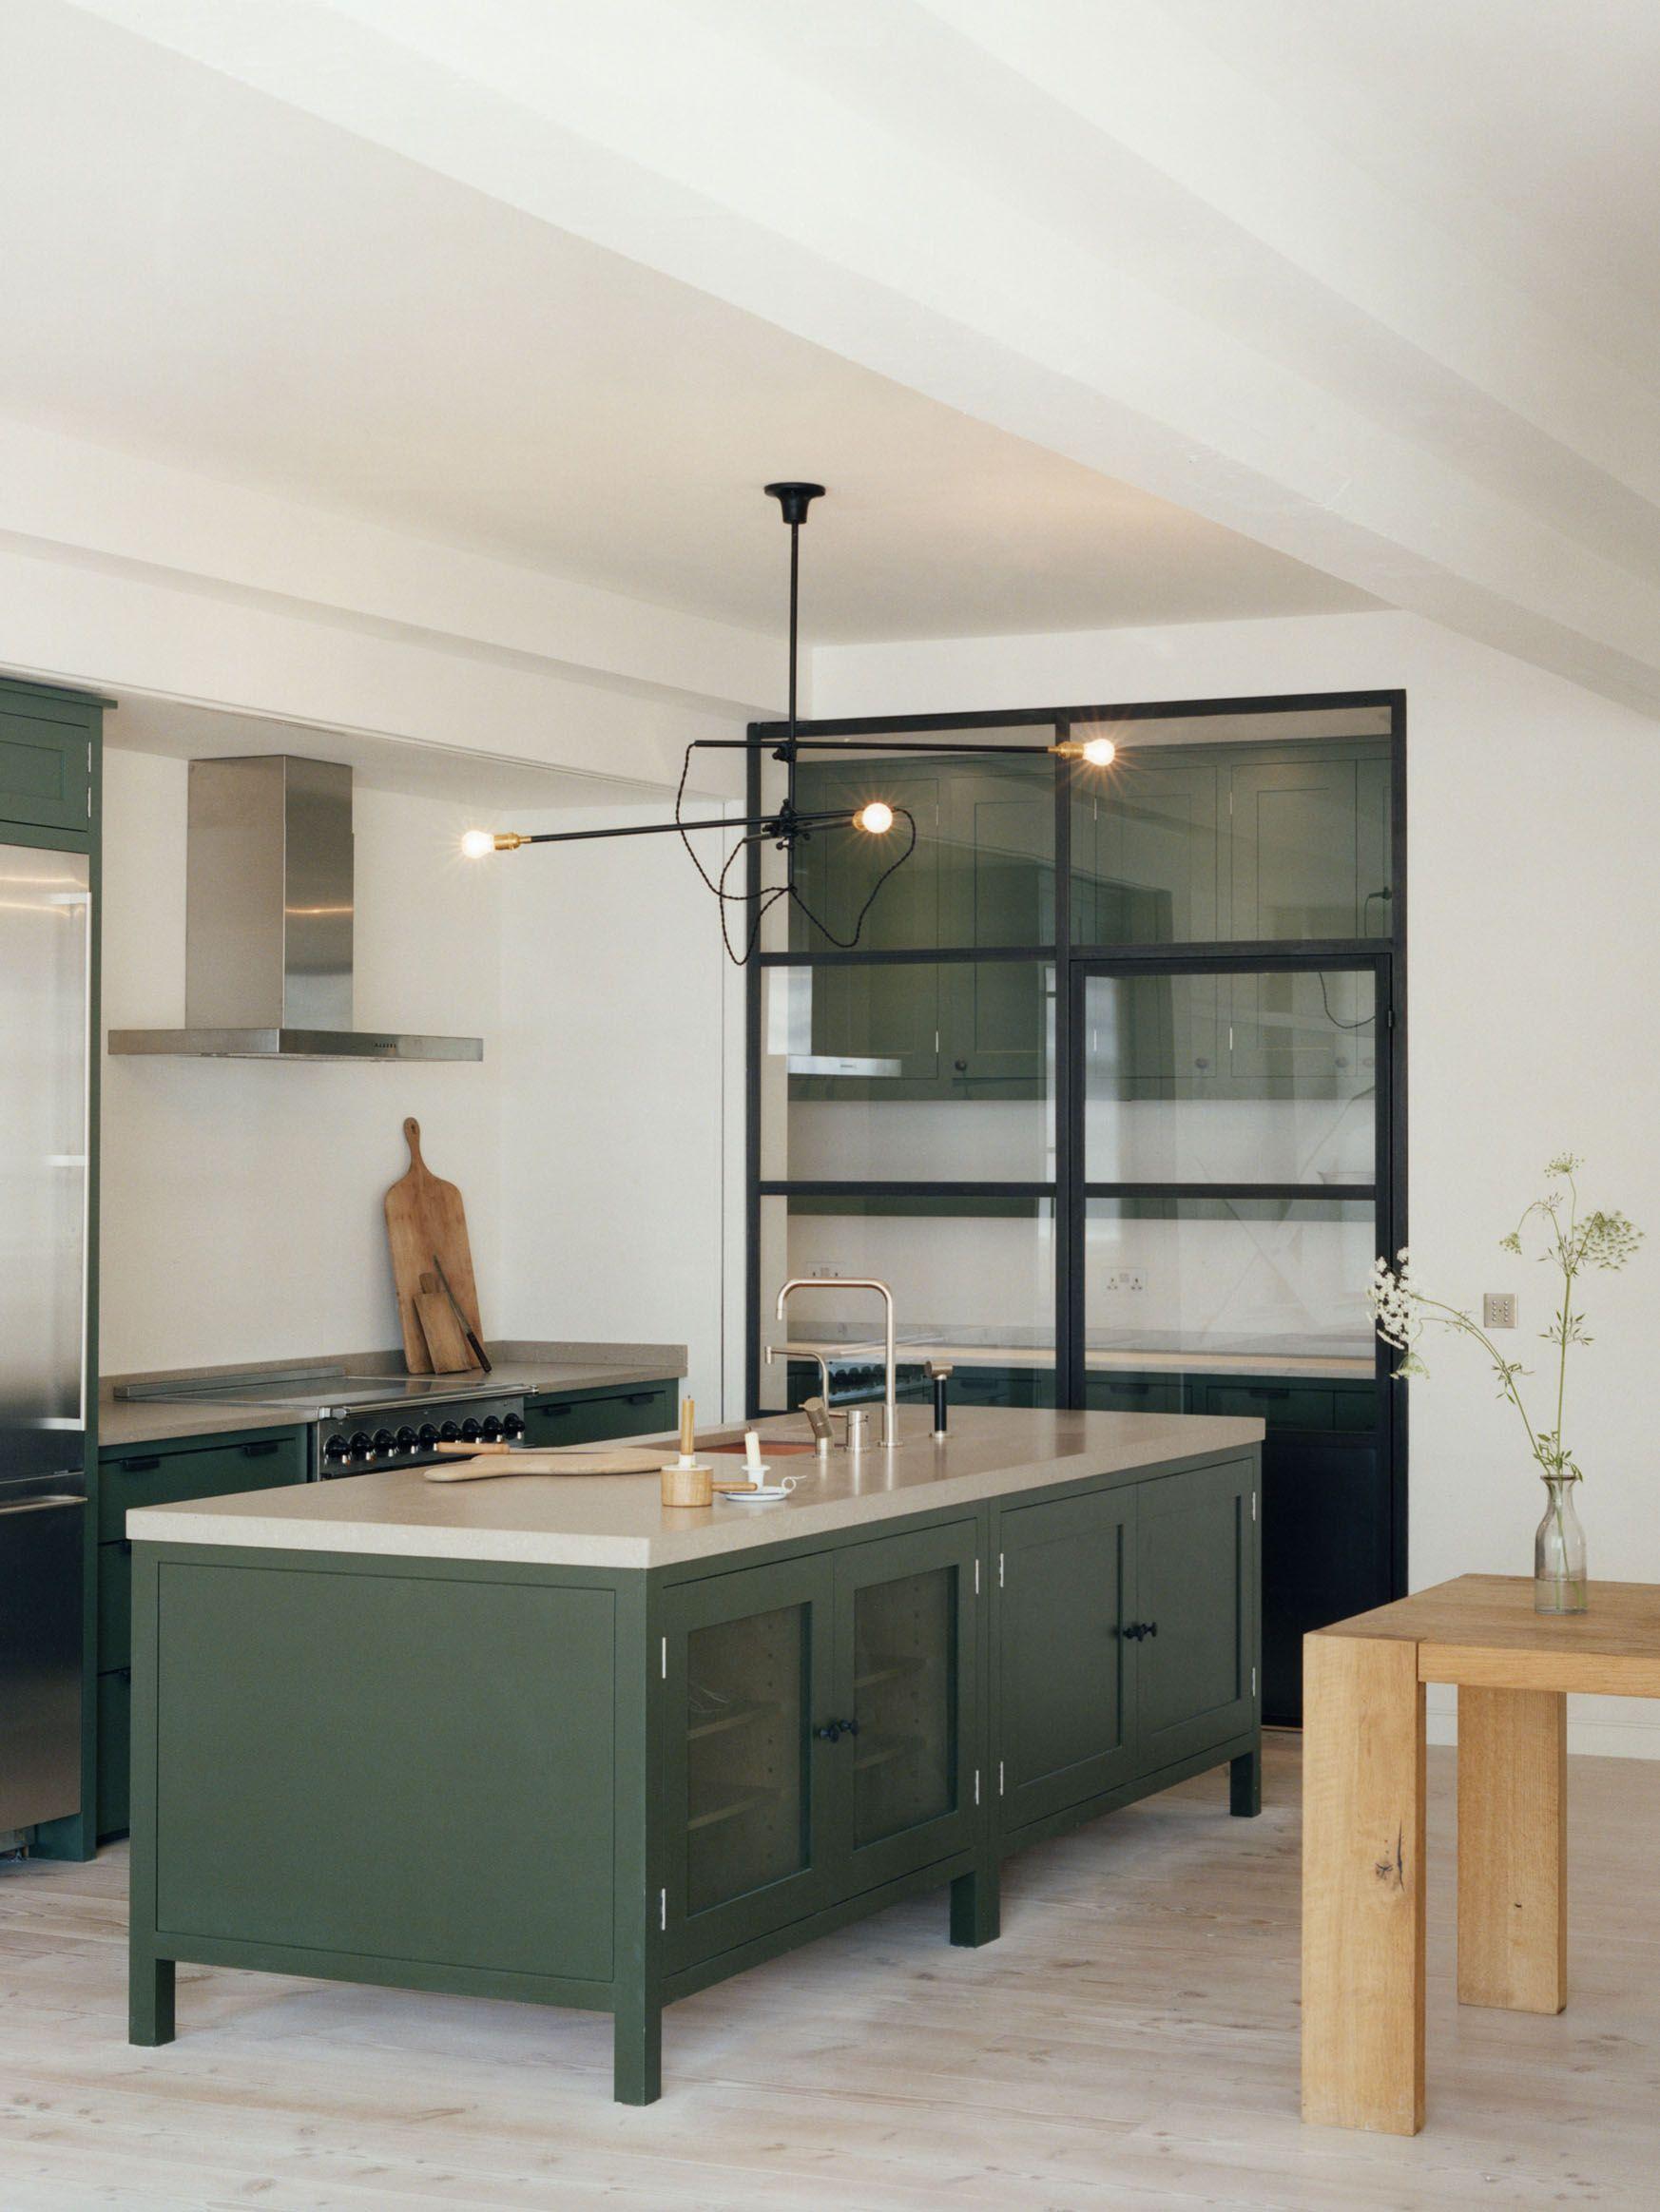 Green Kitchens Lexi Westergard Design Blog In